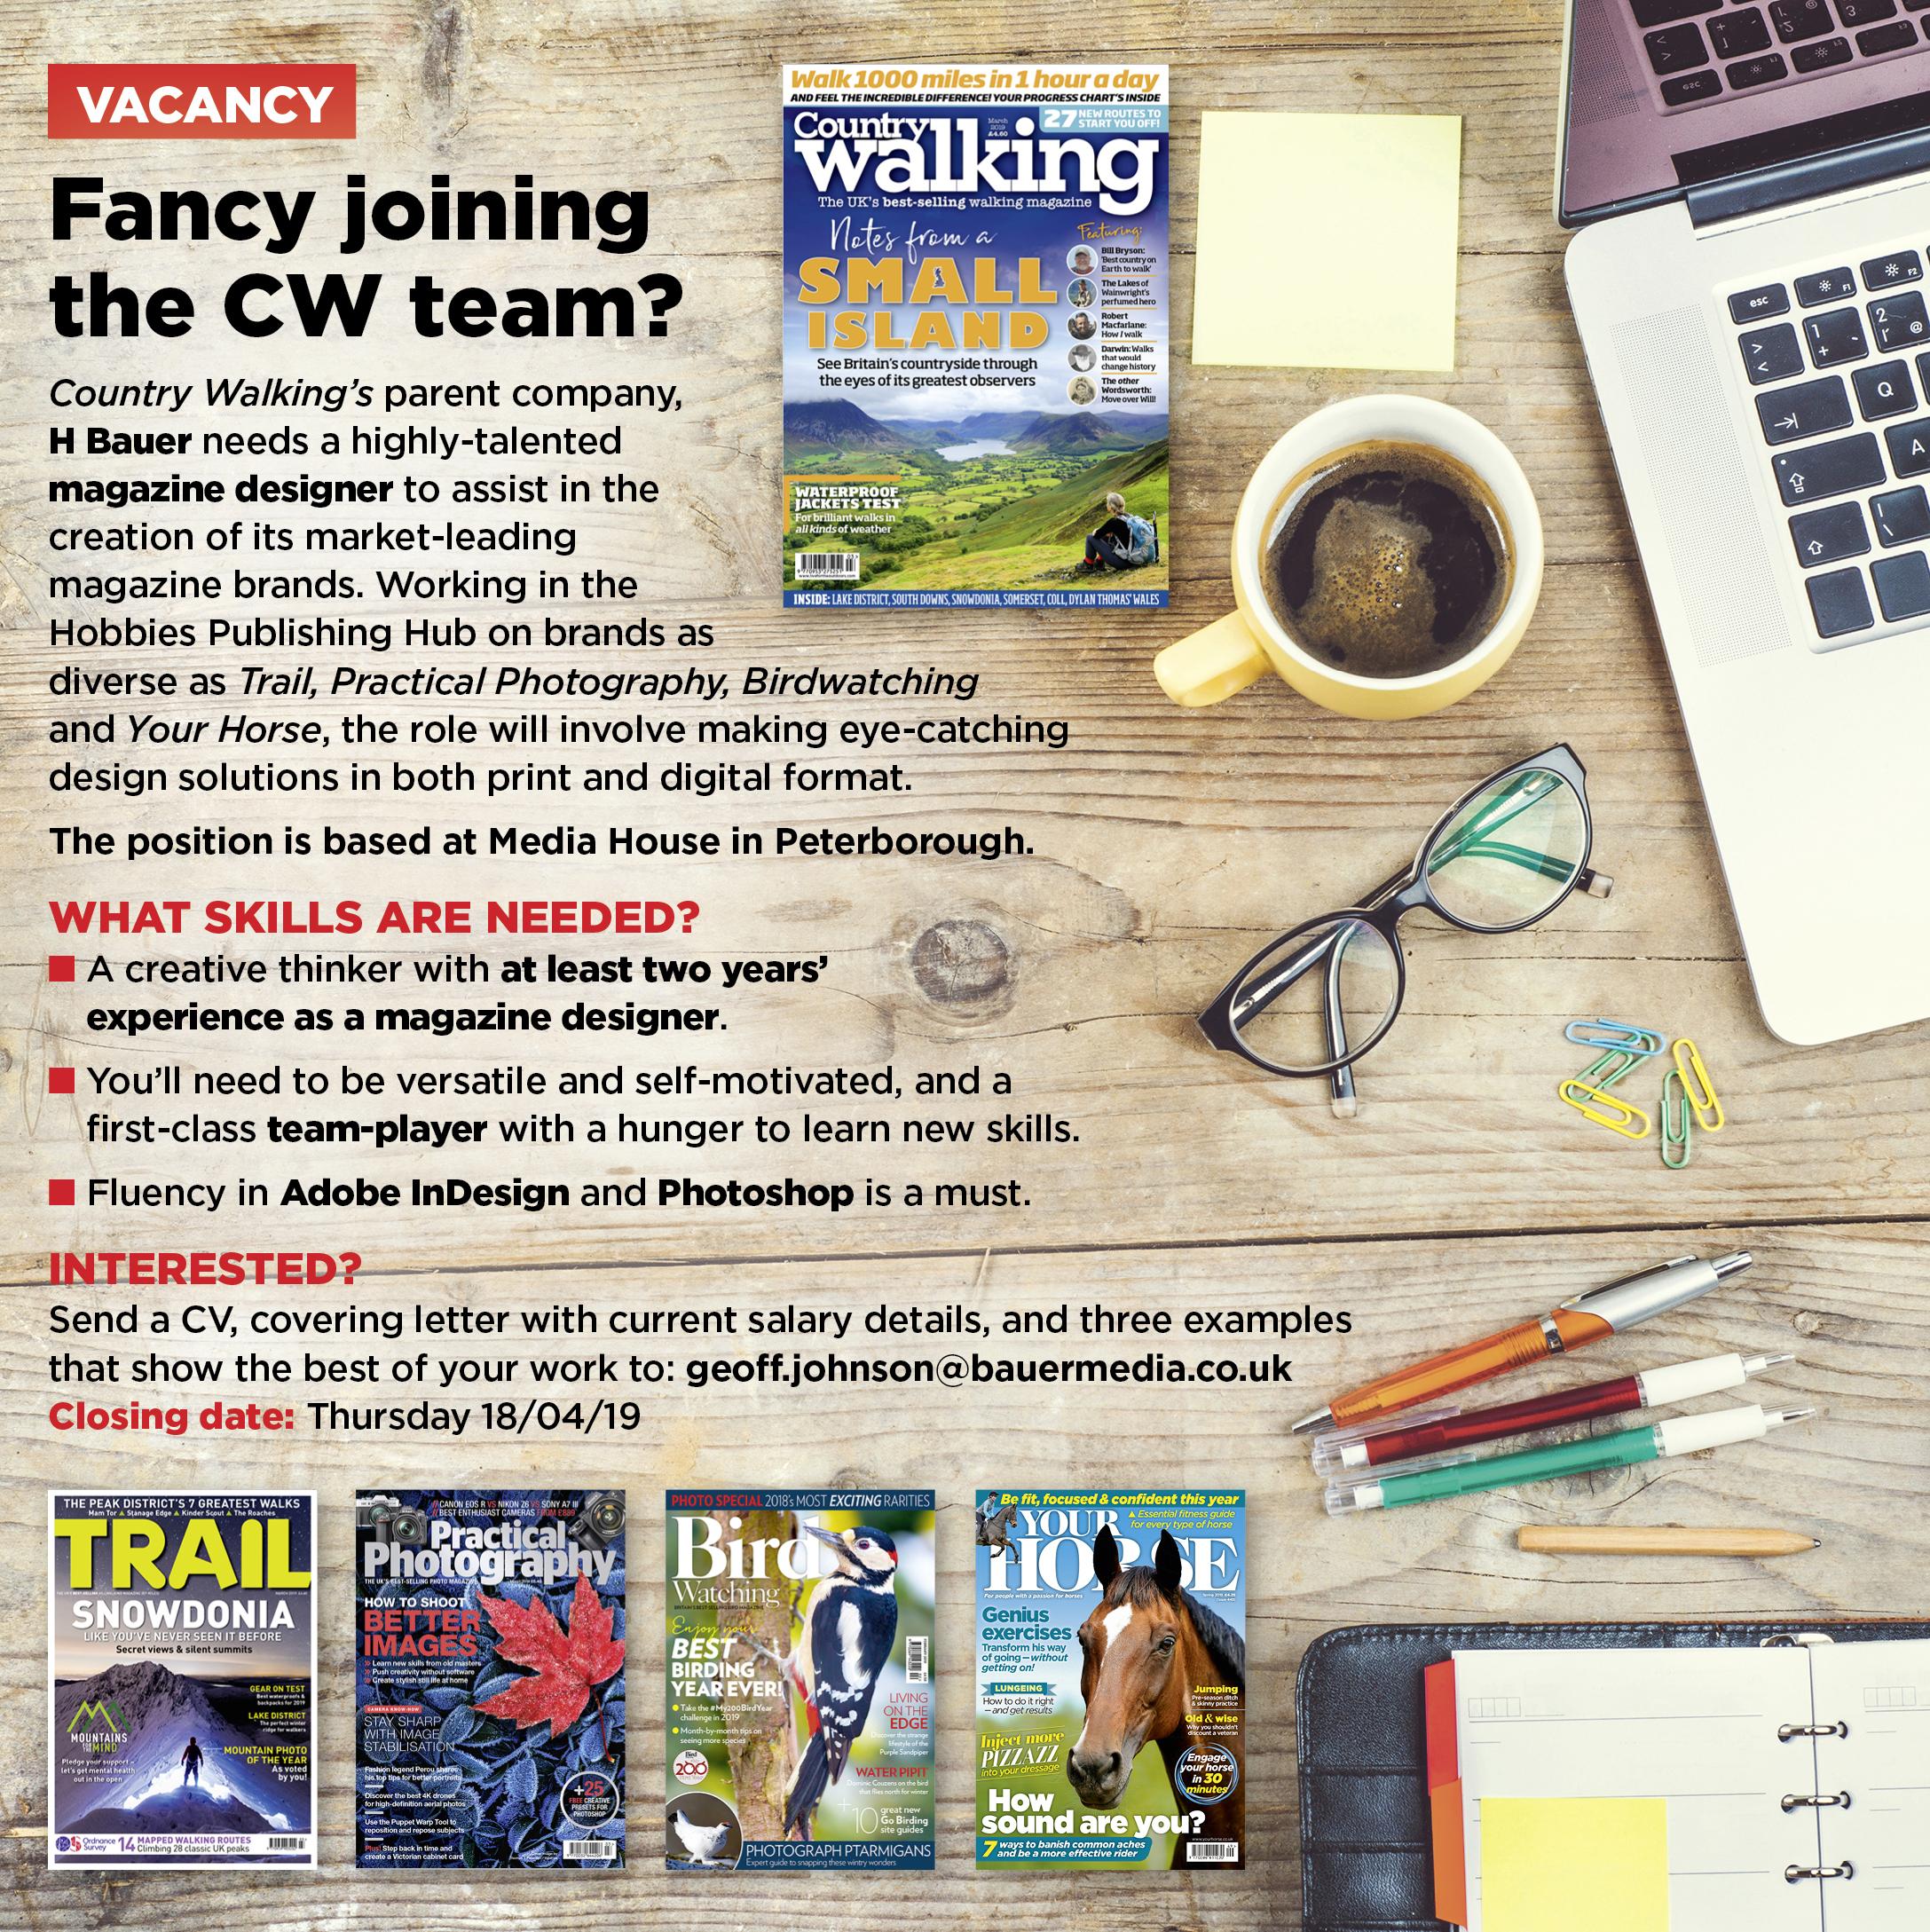 2Design job_Facebook ad_CW click thru.jpg